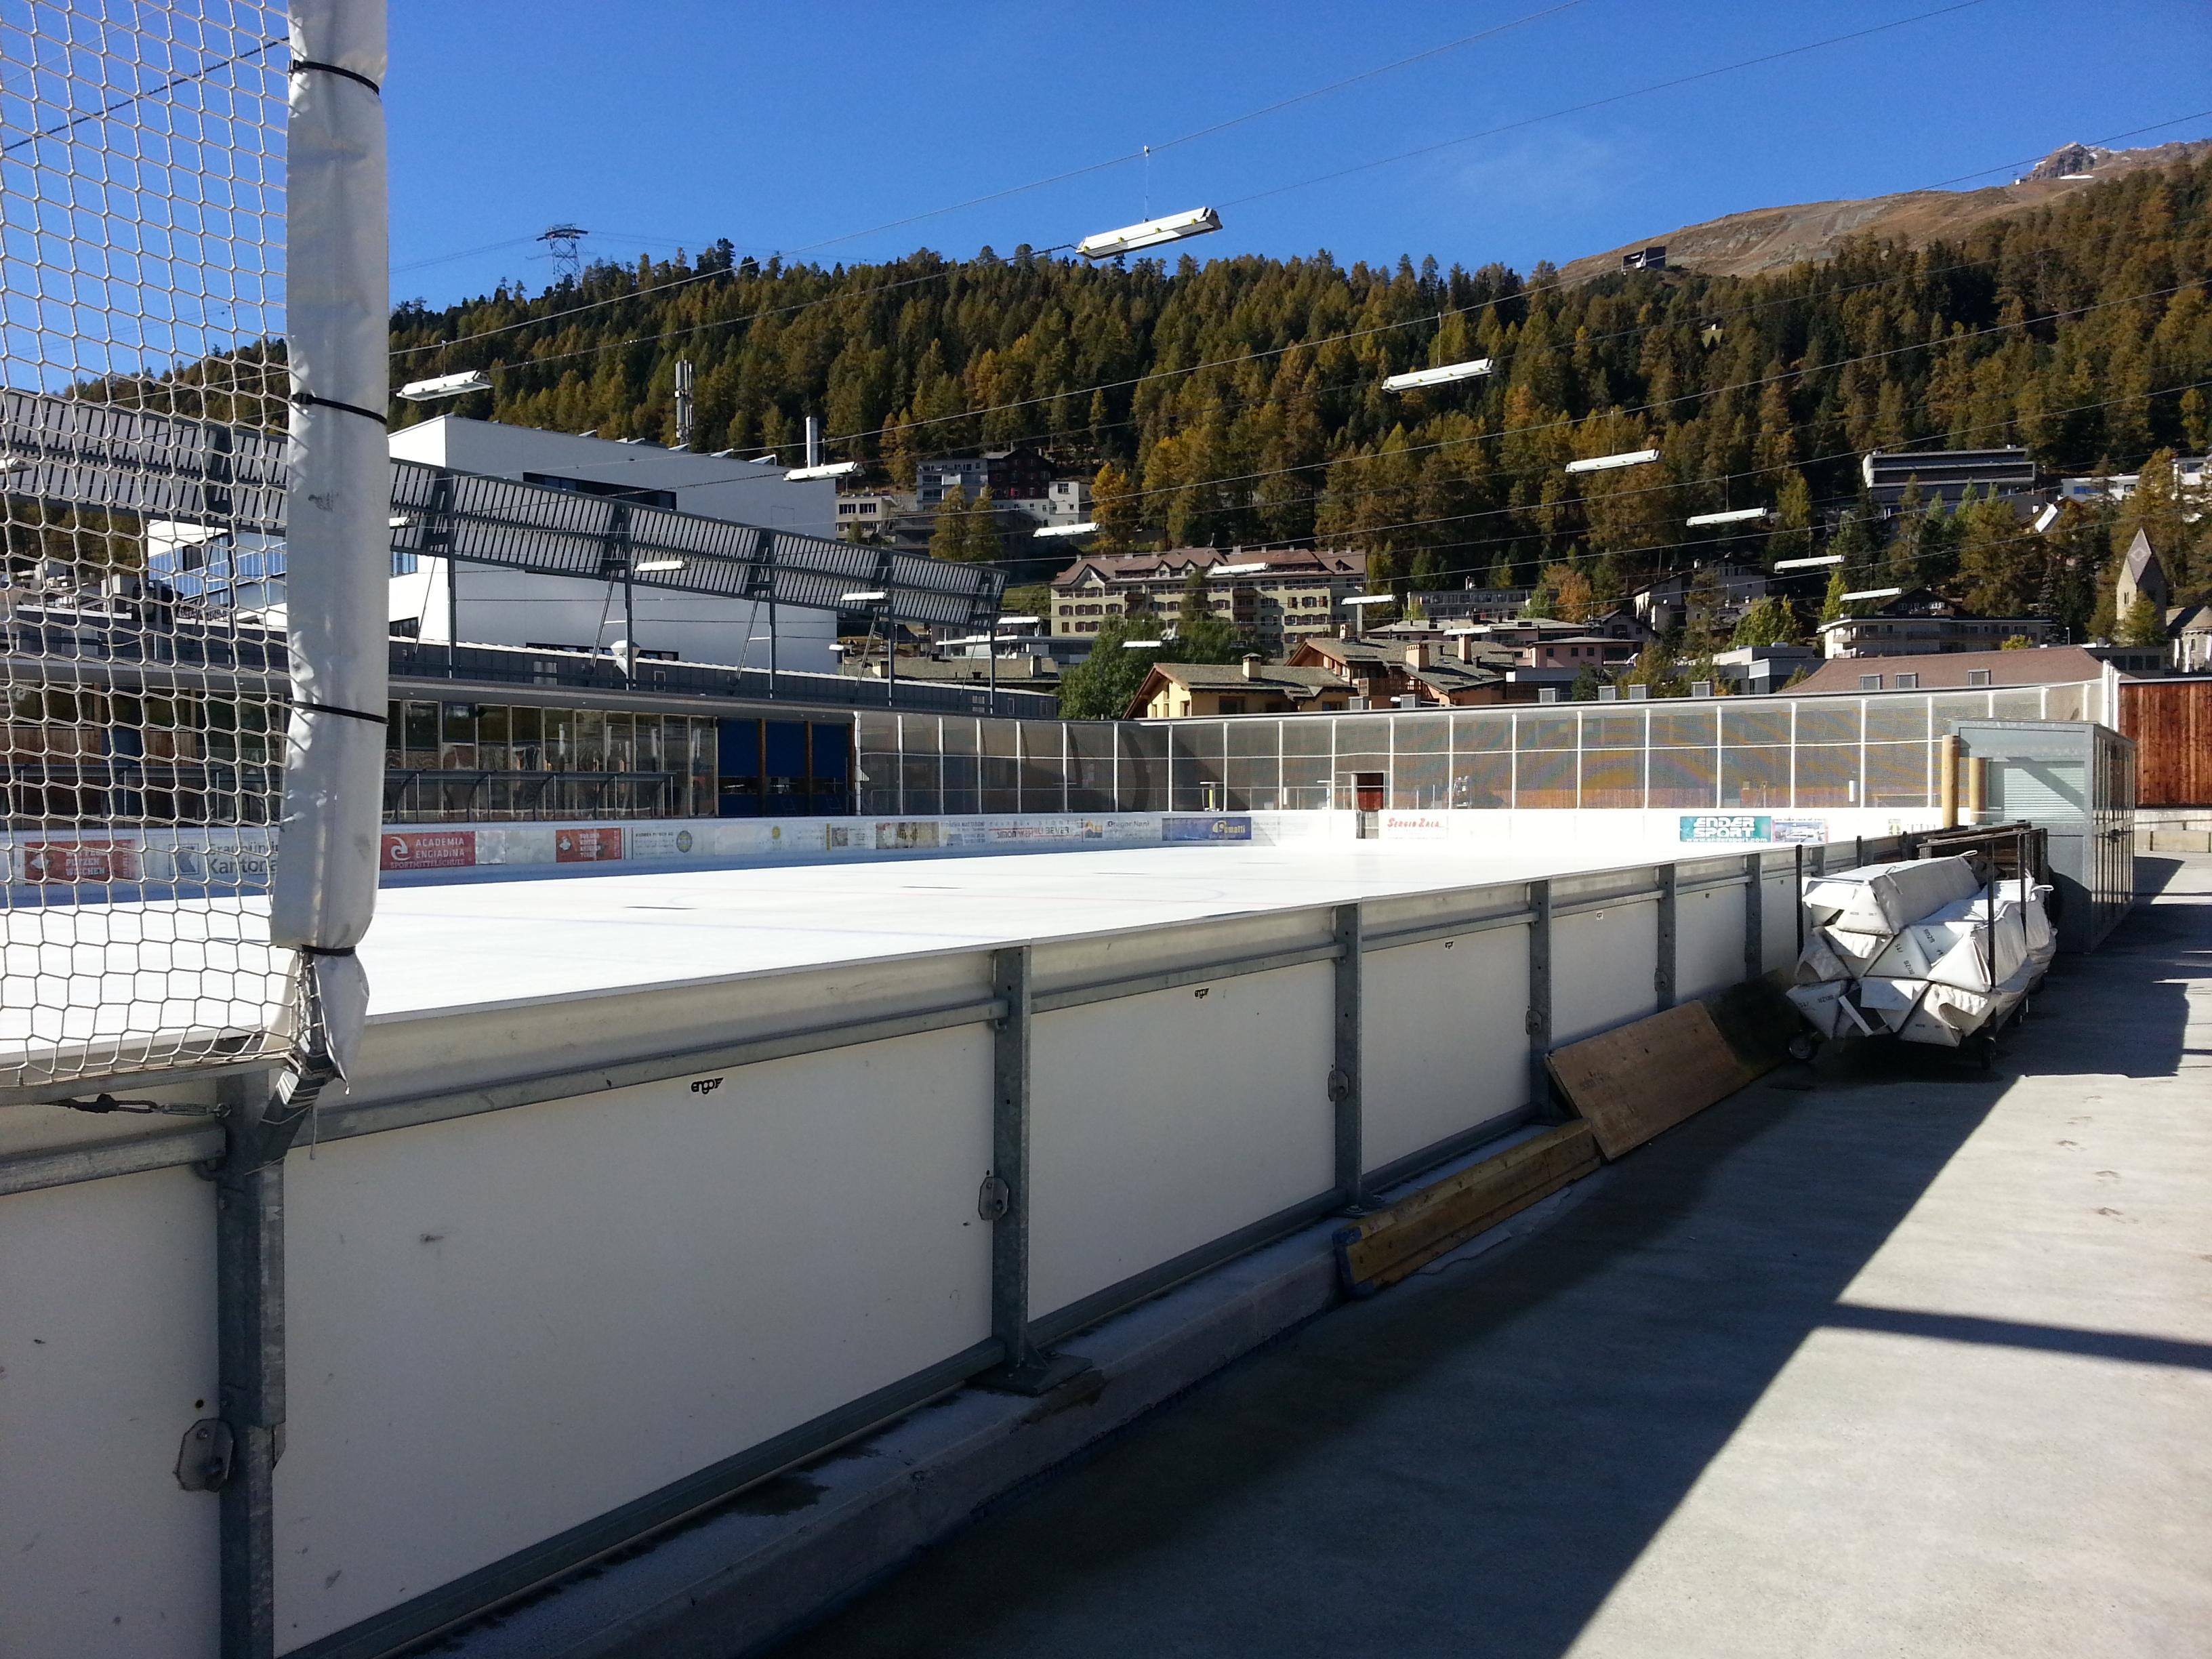 Ice Rink Eisarena Laudains Slide 2